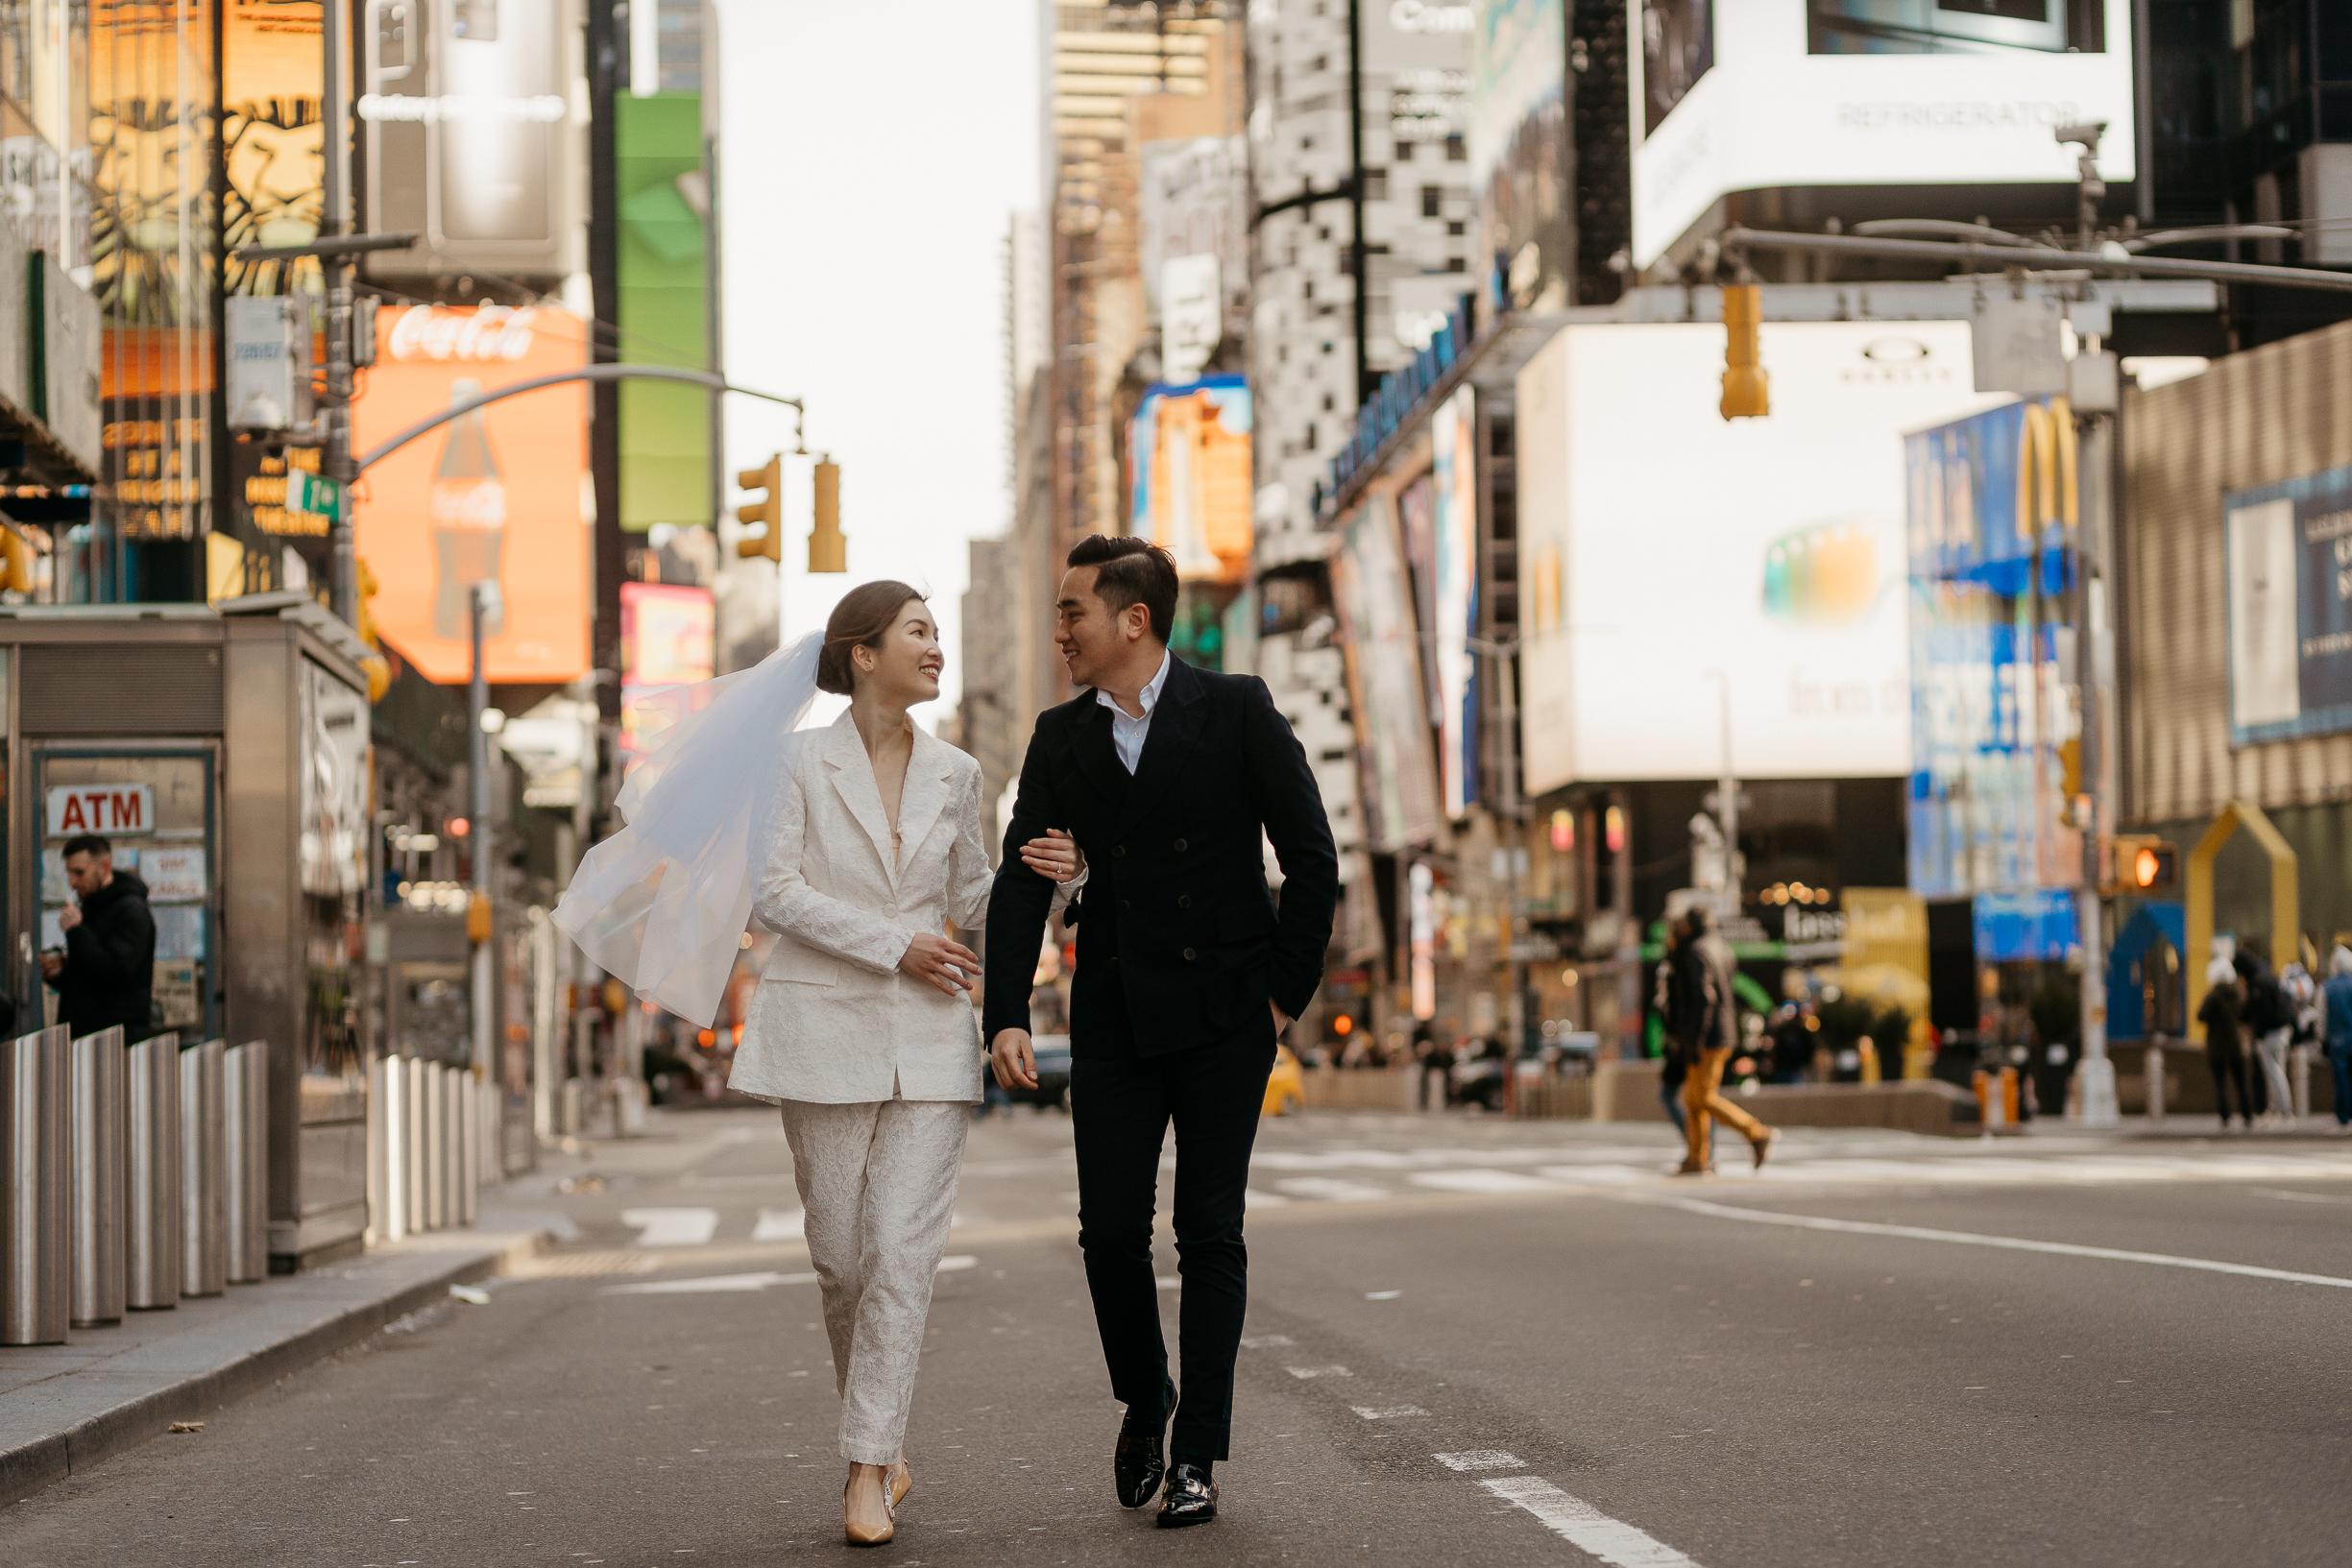 New york times square pre-wedding photoshoot